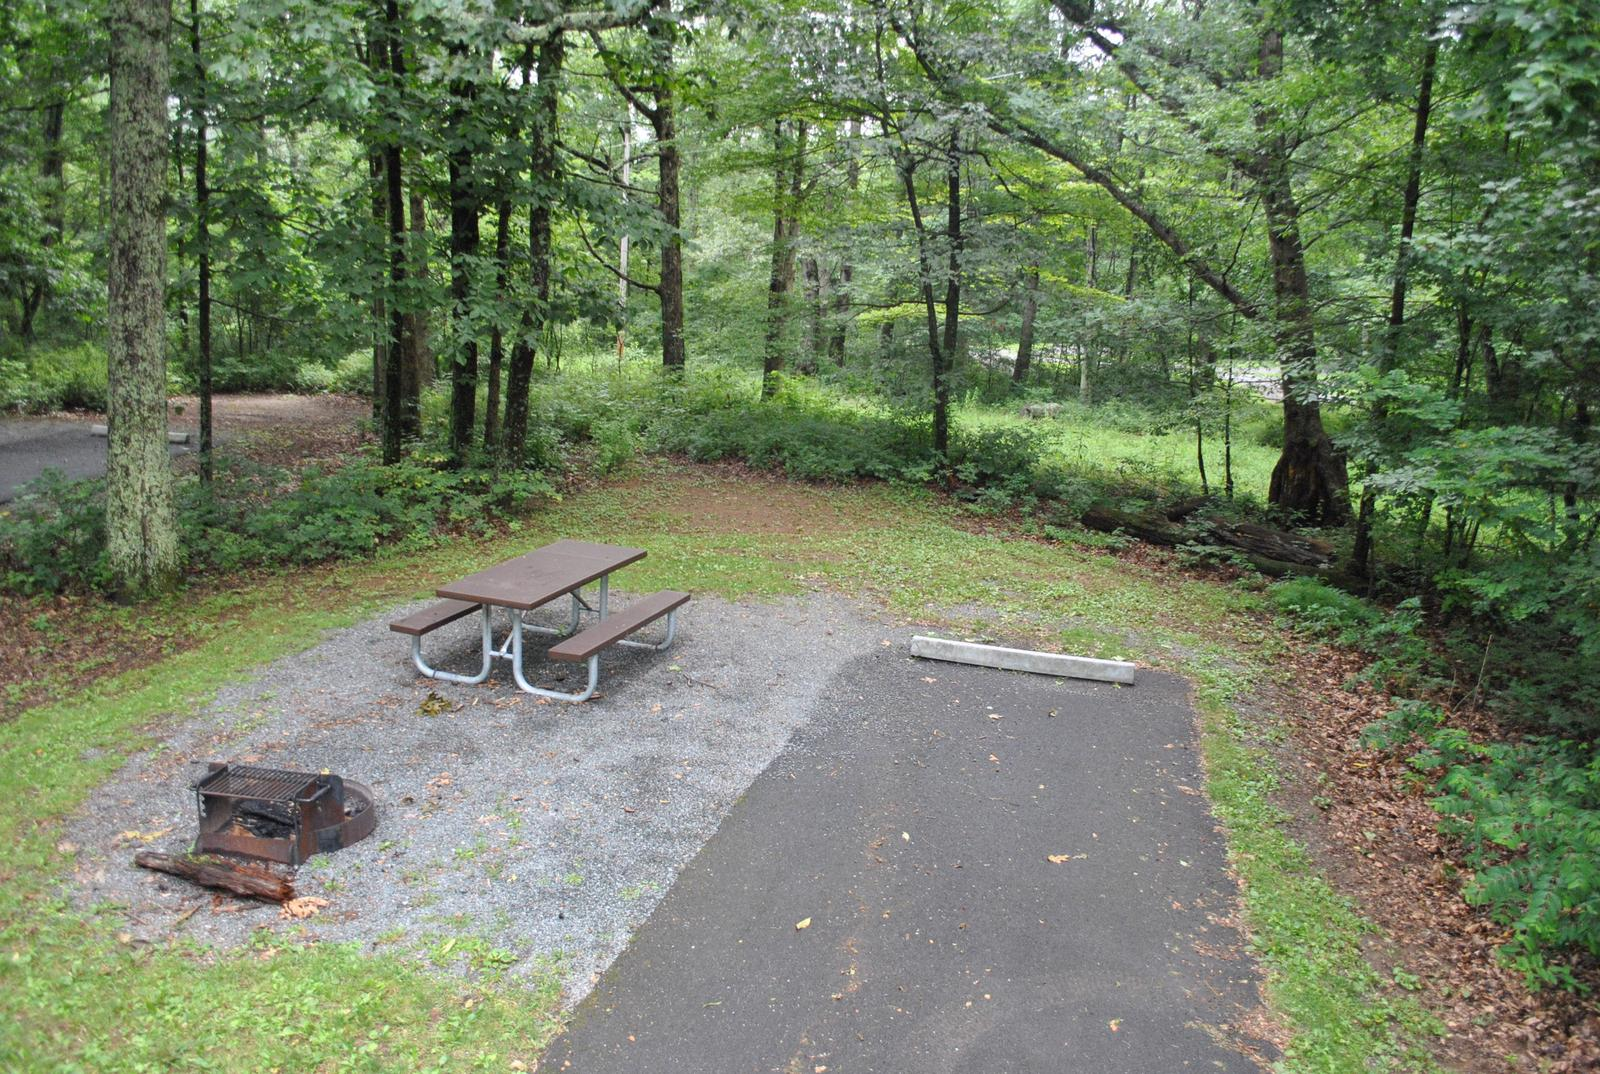 Mathews Arm Campground – Site A014